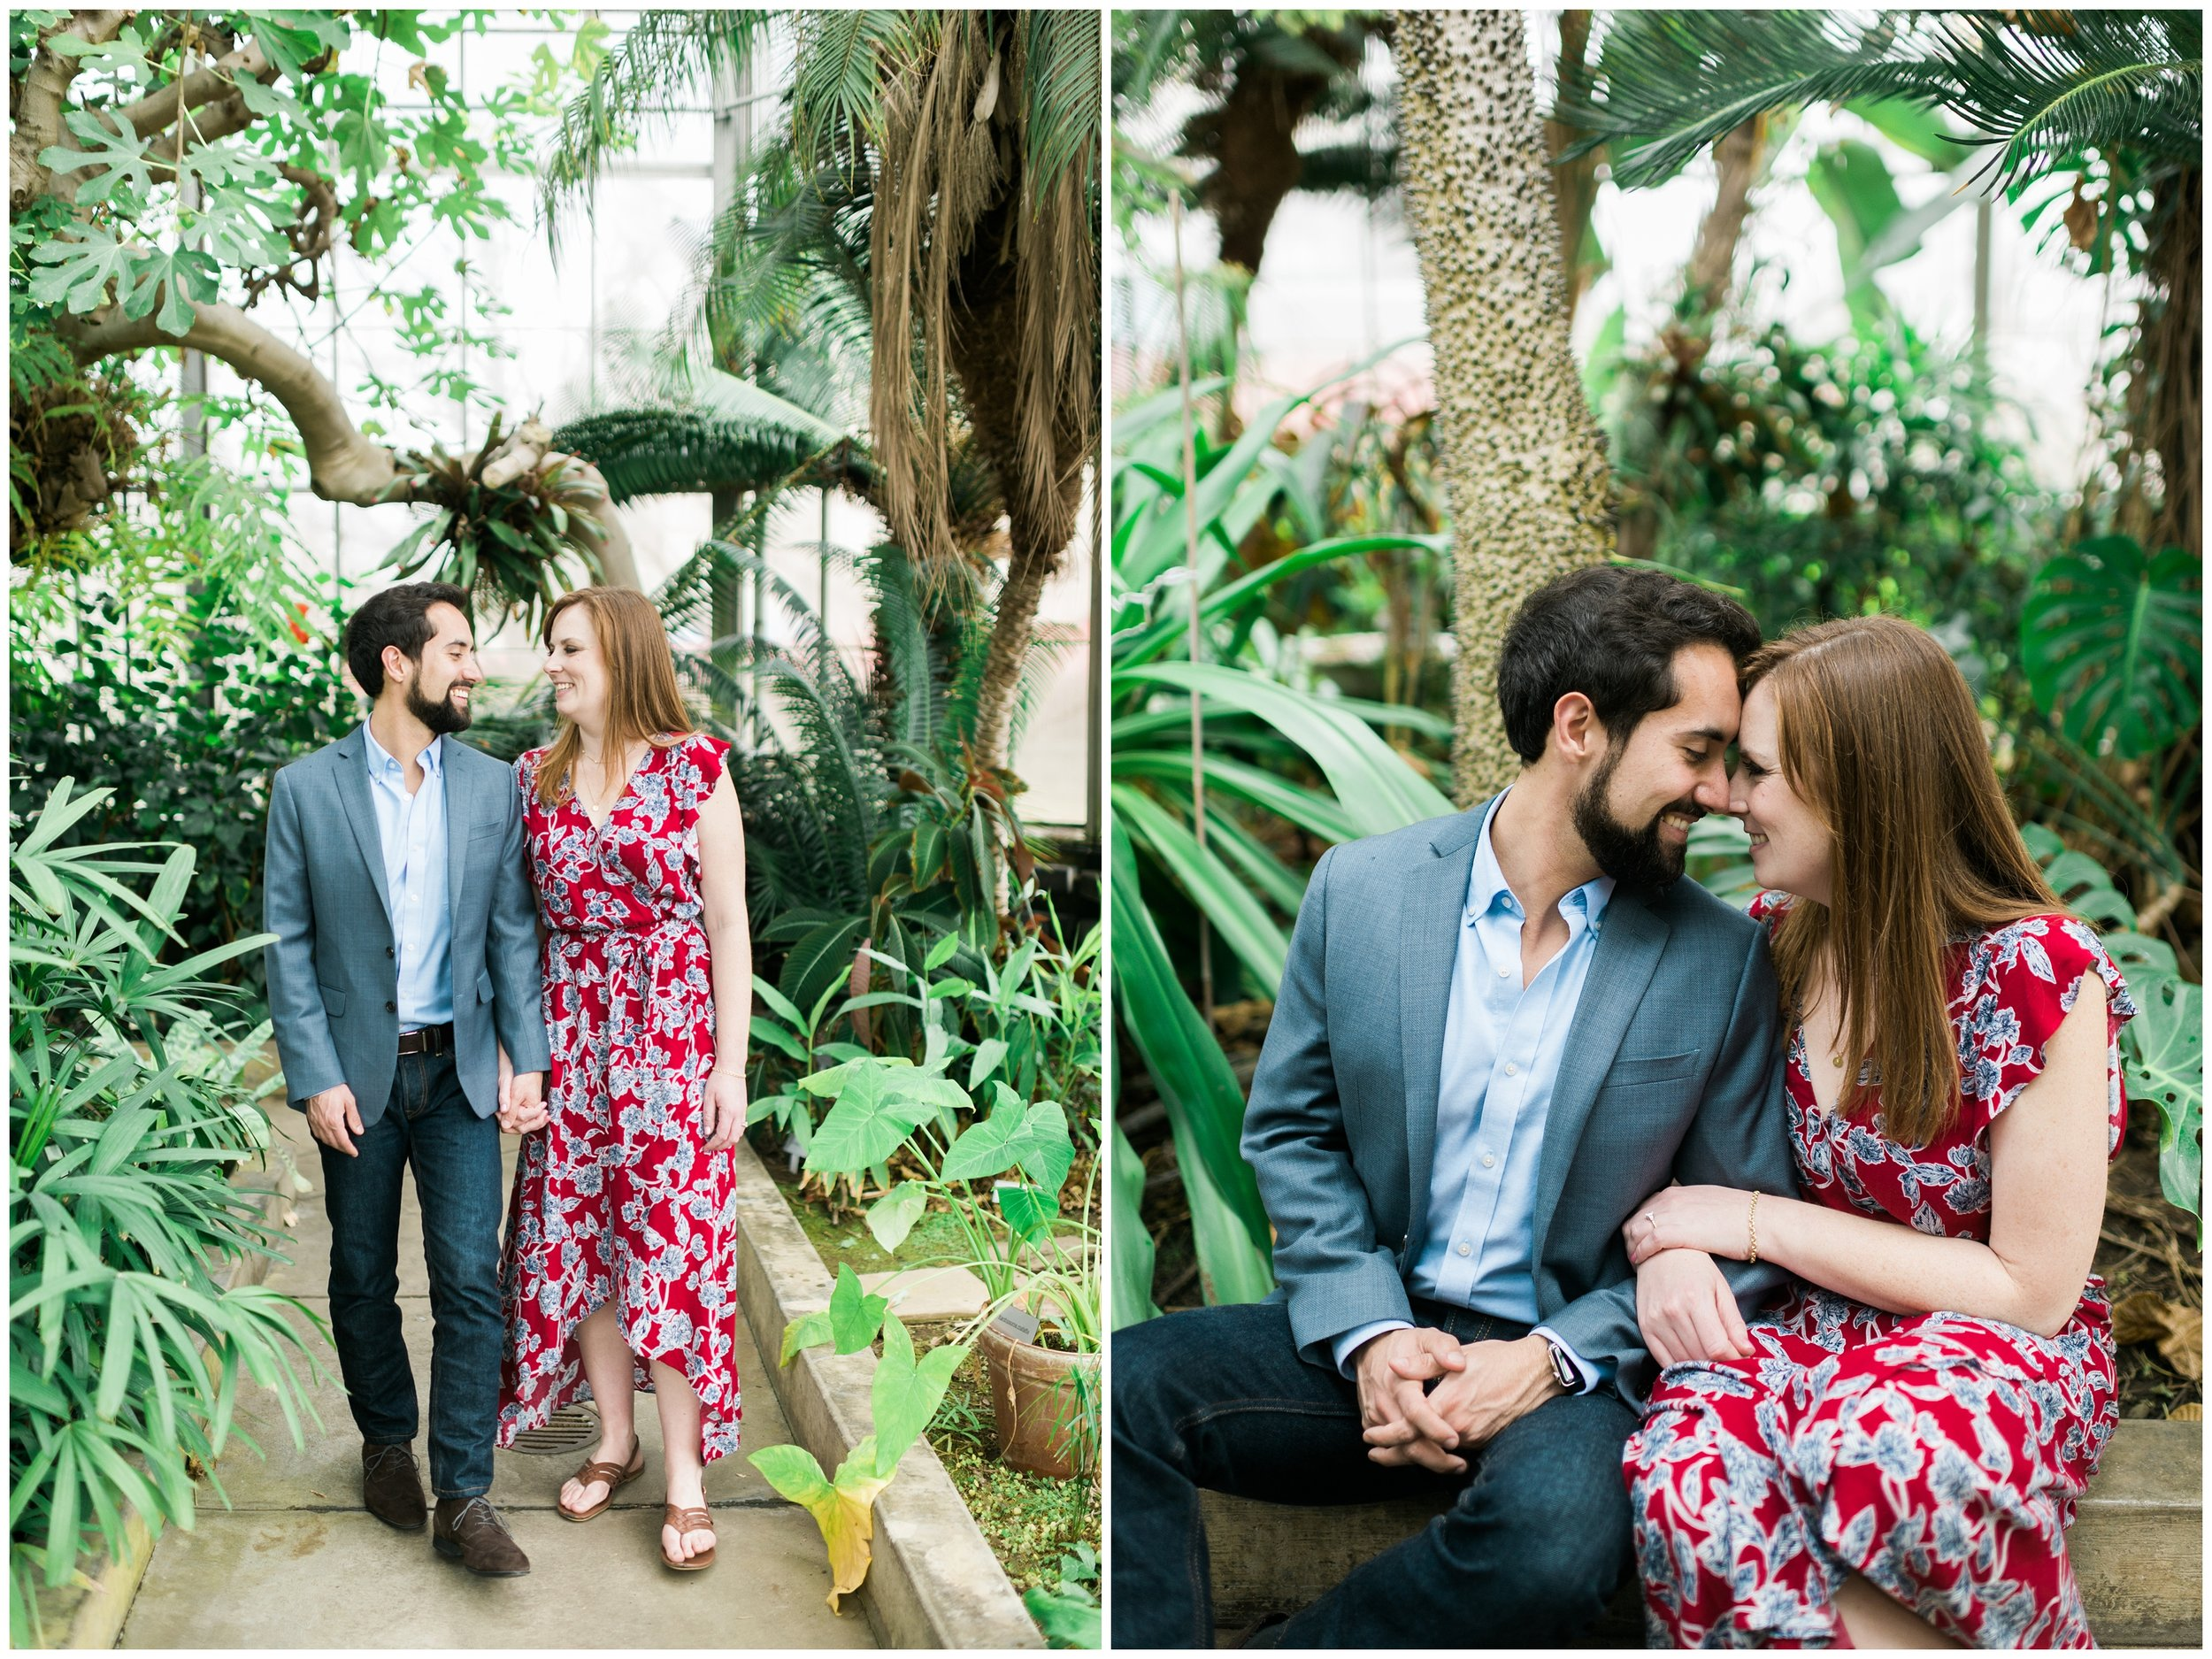 Rebecca_Bridges_Photography_Indianapolis_Wedding_Photographer_6002.jpg